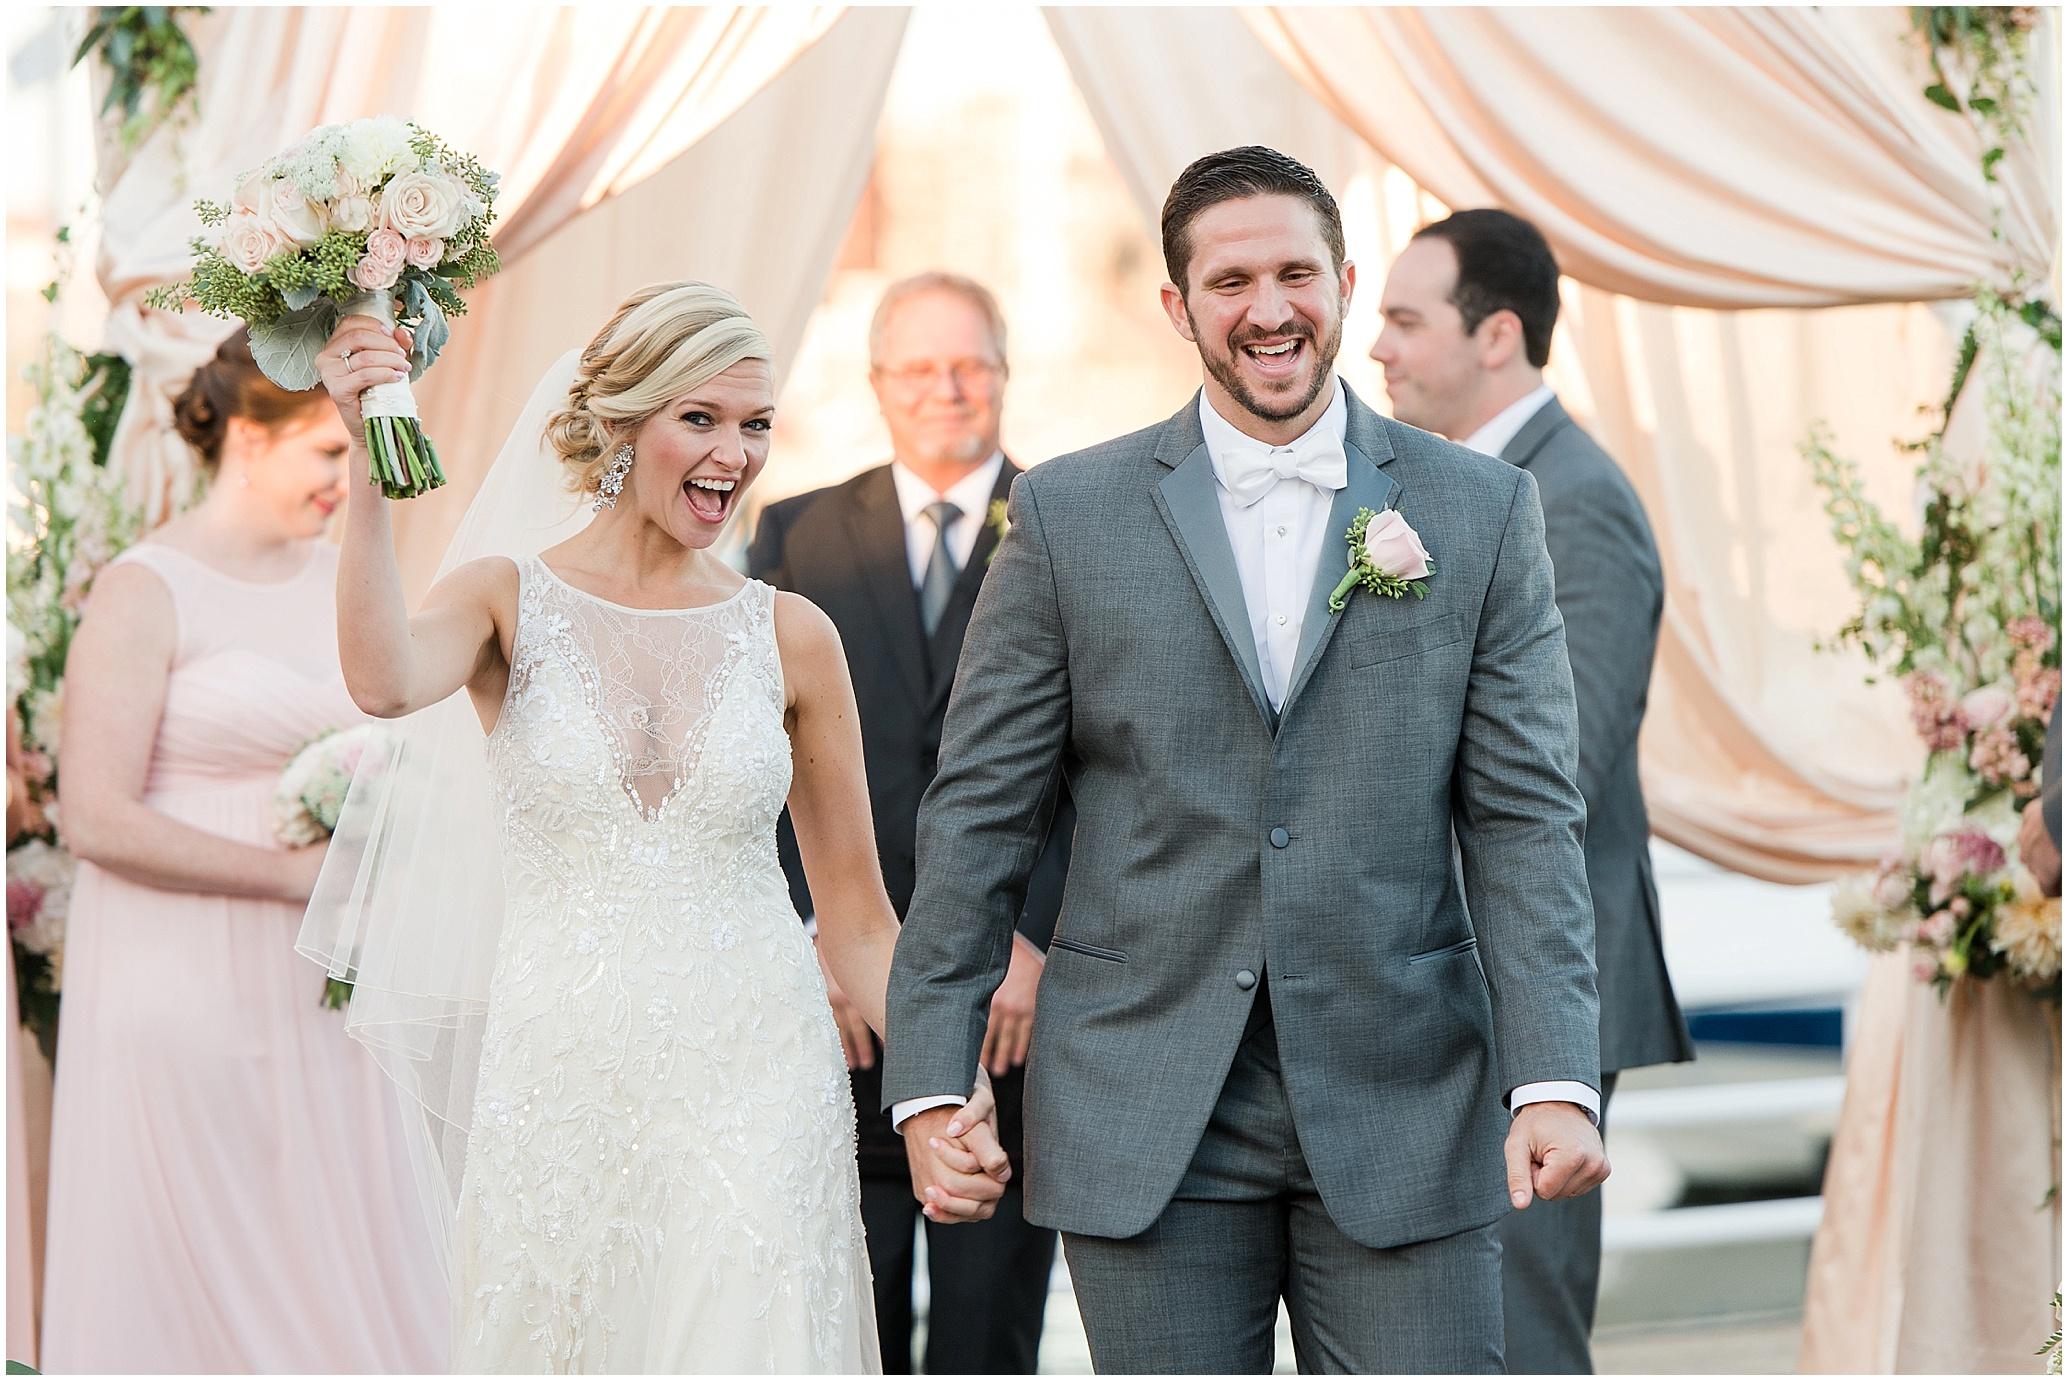 Hannah Leigh Photography Tabrizis Baltimore Wedding_2314.jpg